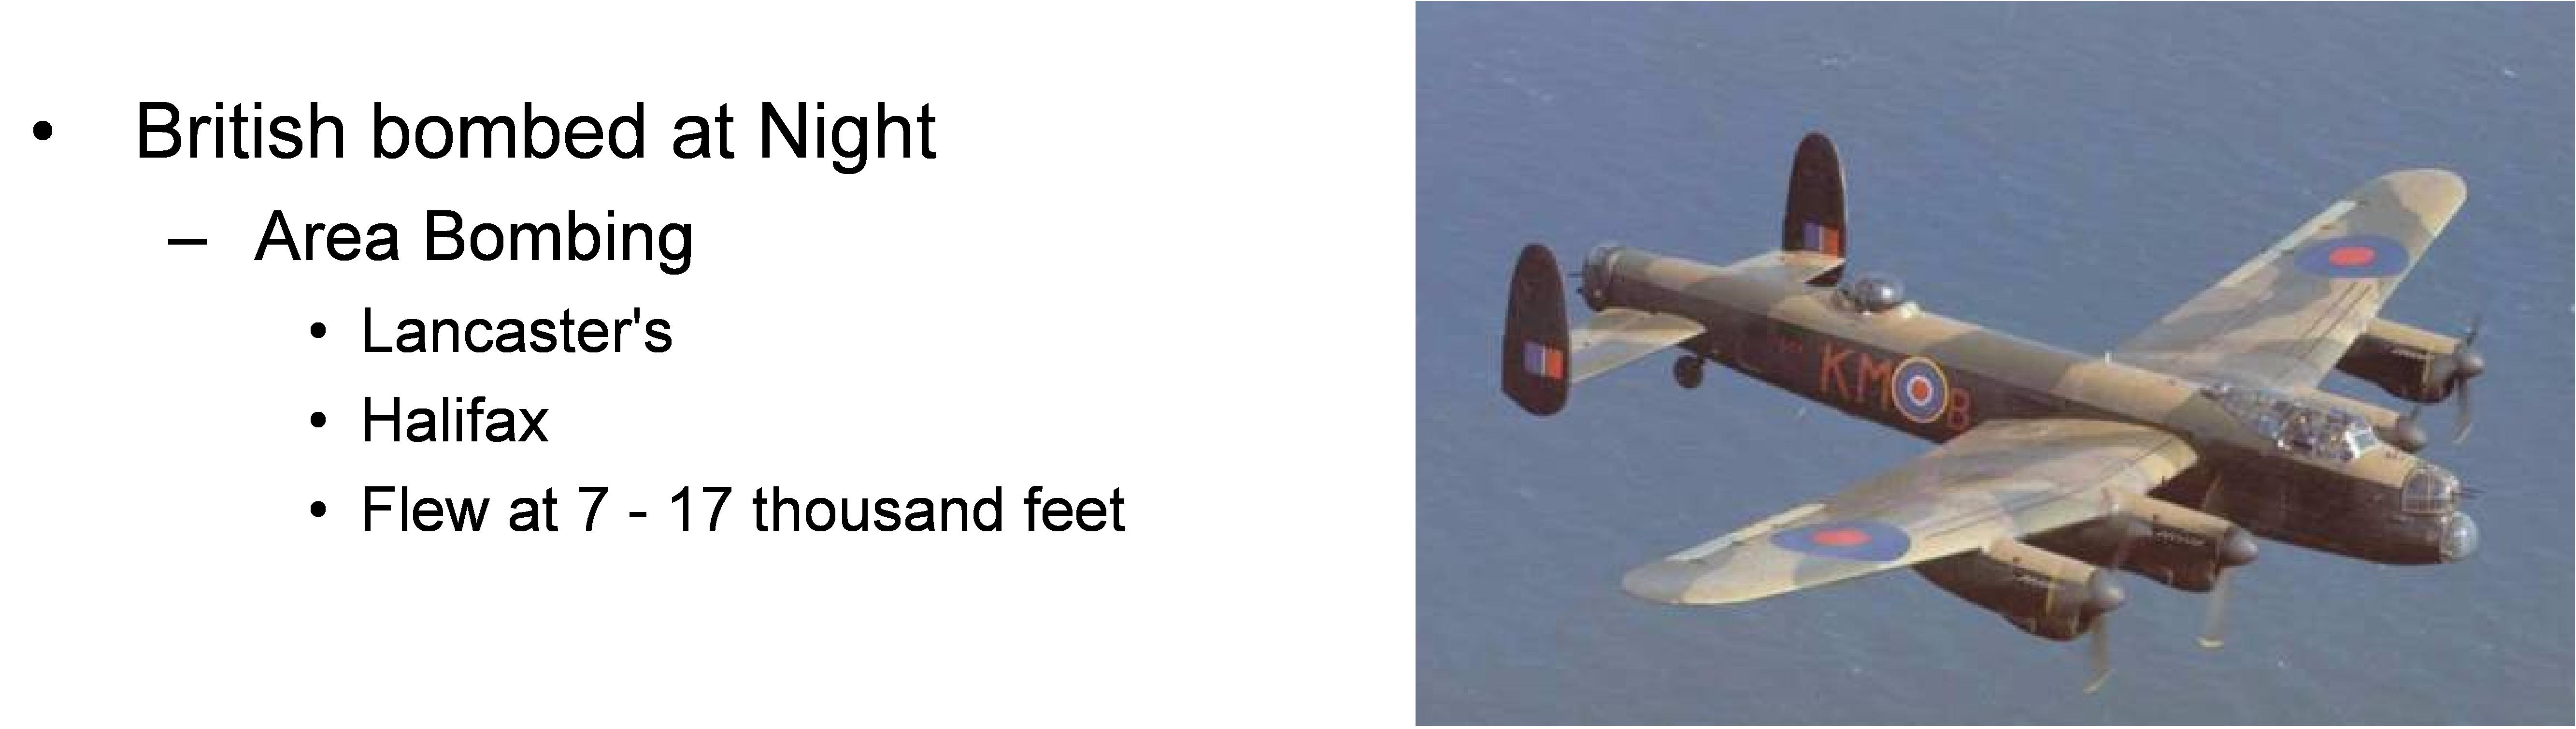 Steve Blank World War II